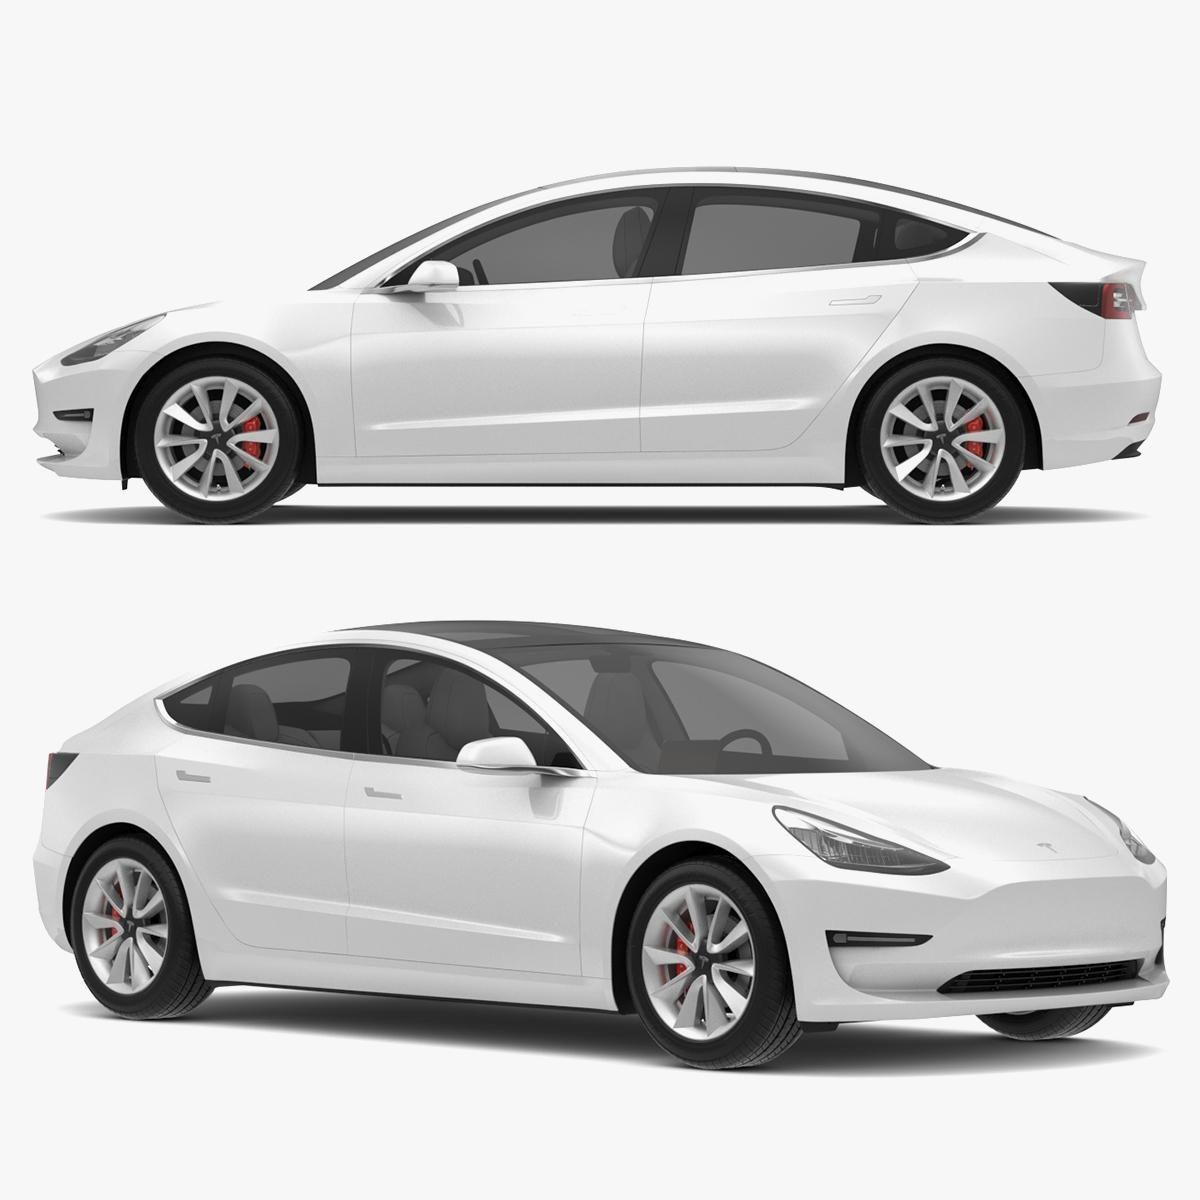 2018 Tesla Model 3 White Multi Coat 3d Model Ad Model Tesla Coat Multi In 2021 2018 Tesla Model 3 Tesla Model Tesla